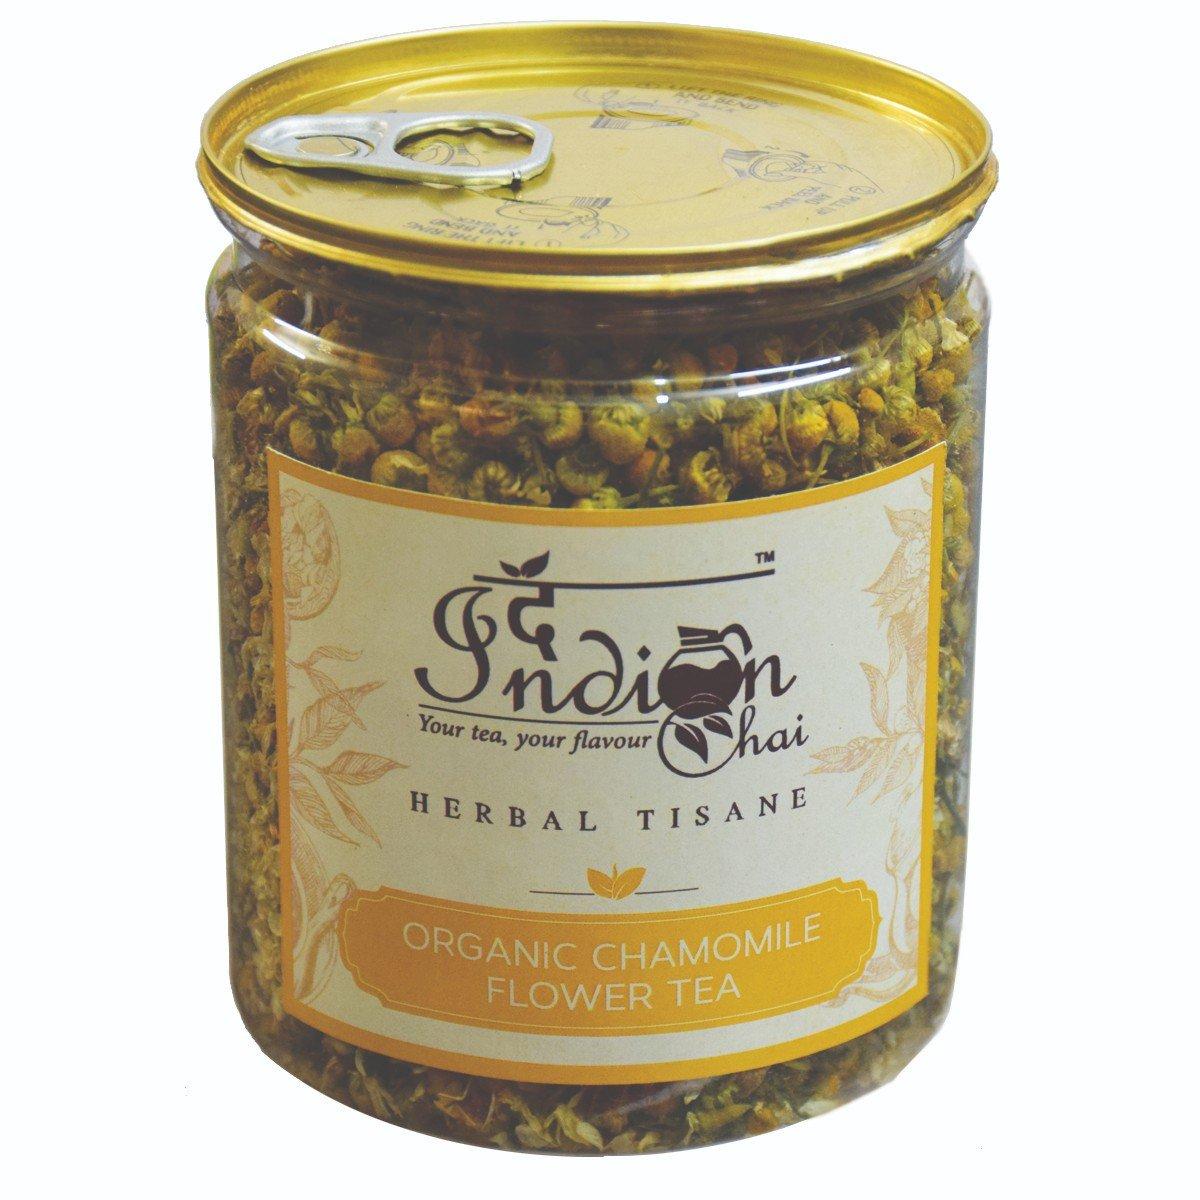 The Indian Chai Organic Chamomile Detox Tea